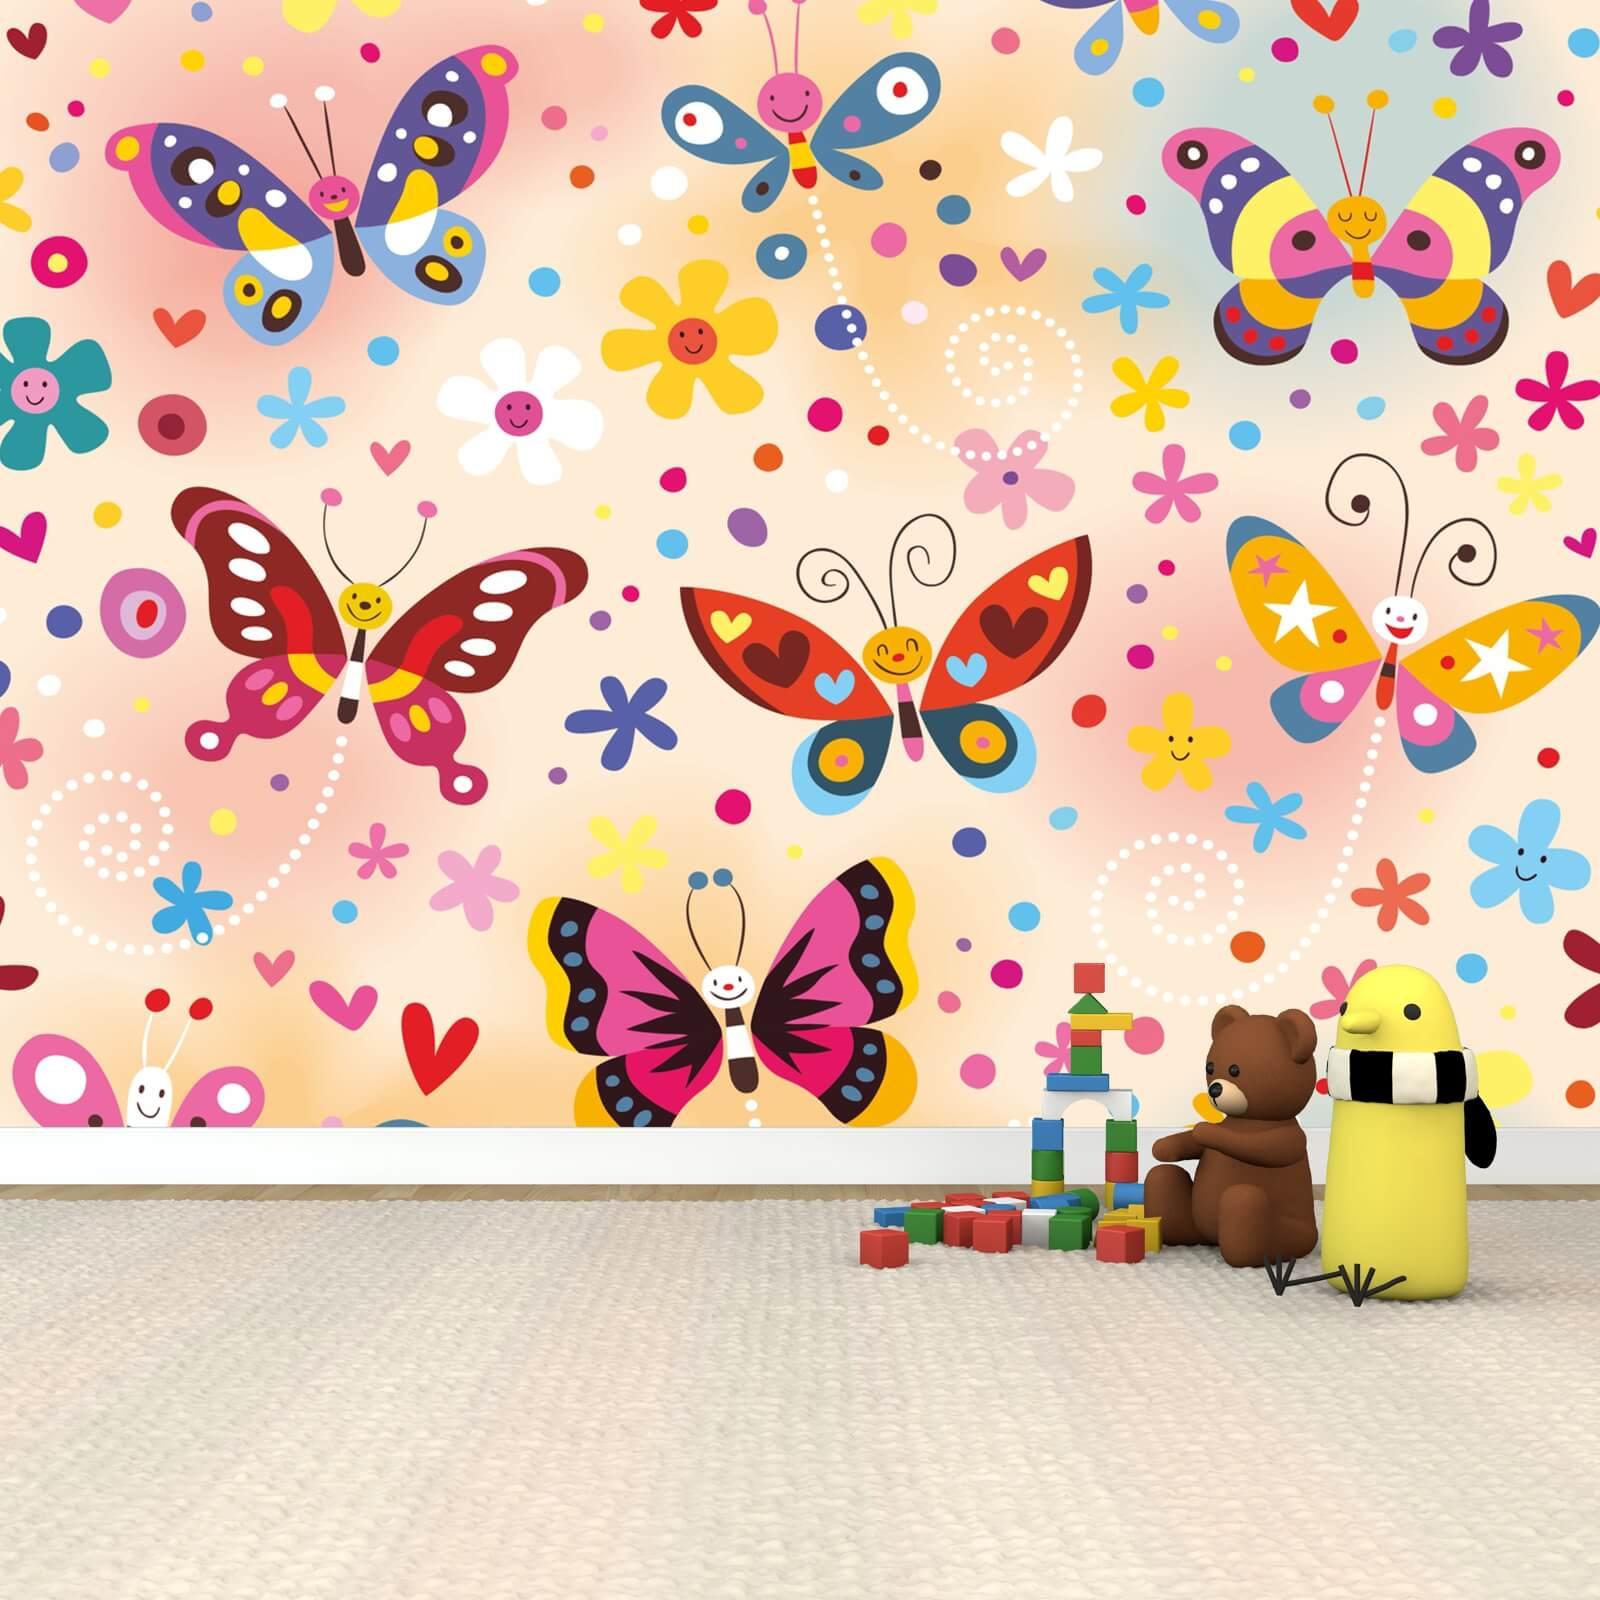 Kinderzimmer Tapete Vlies XXL-Poster Fototapete Schmetterlinge bunt rosa